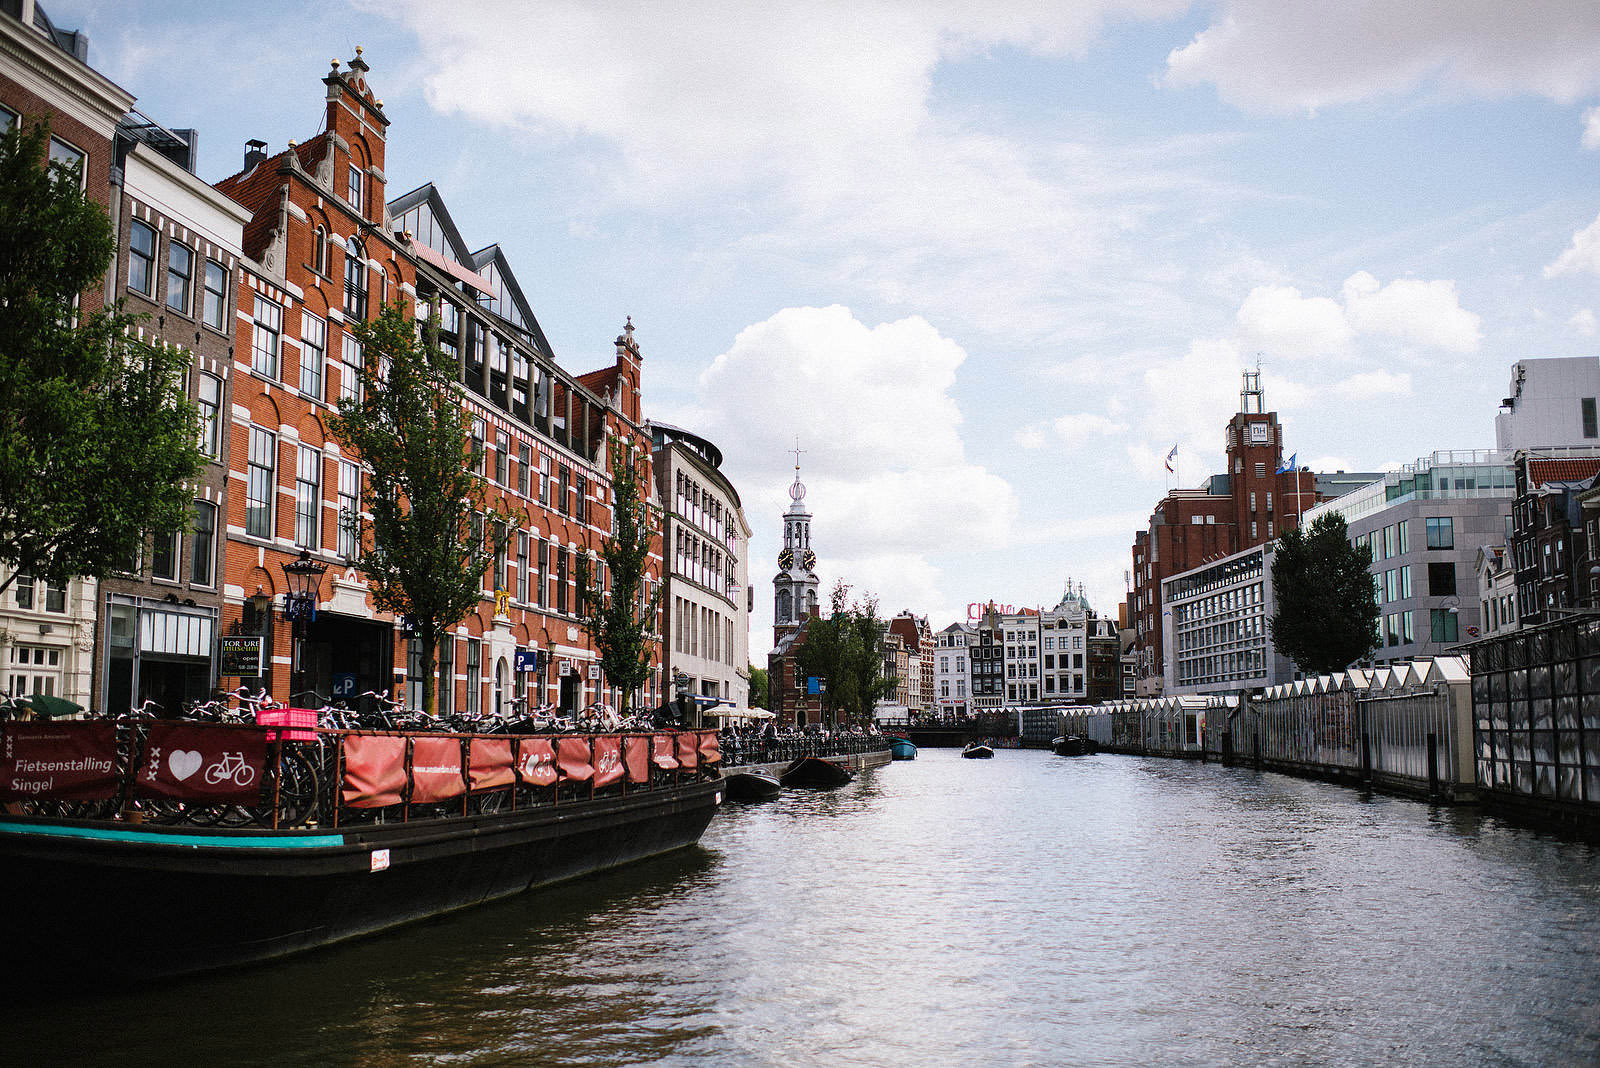 Fotograf Konstanz - Destination Wedding Photographer Amsterdam 053 - Destination Wedding Amsterdam  - 161 -